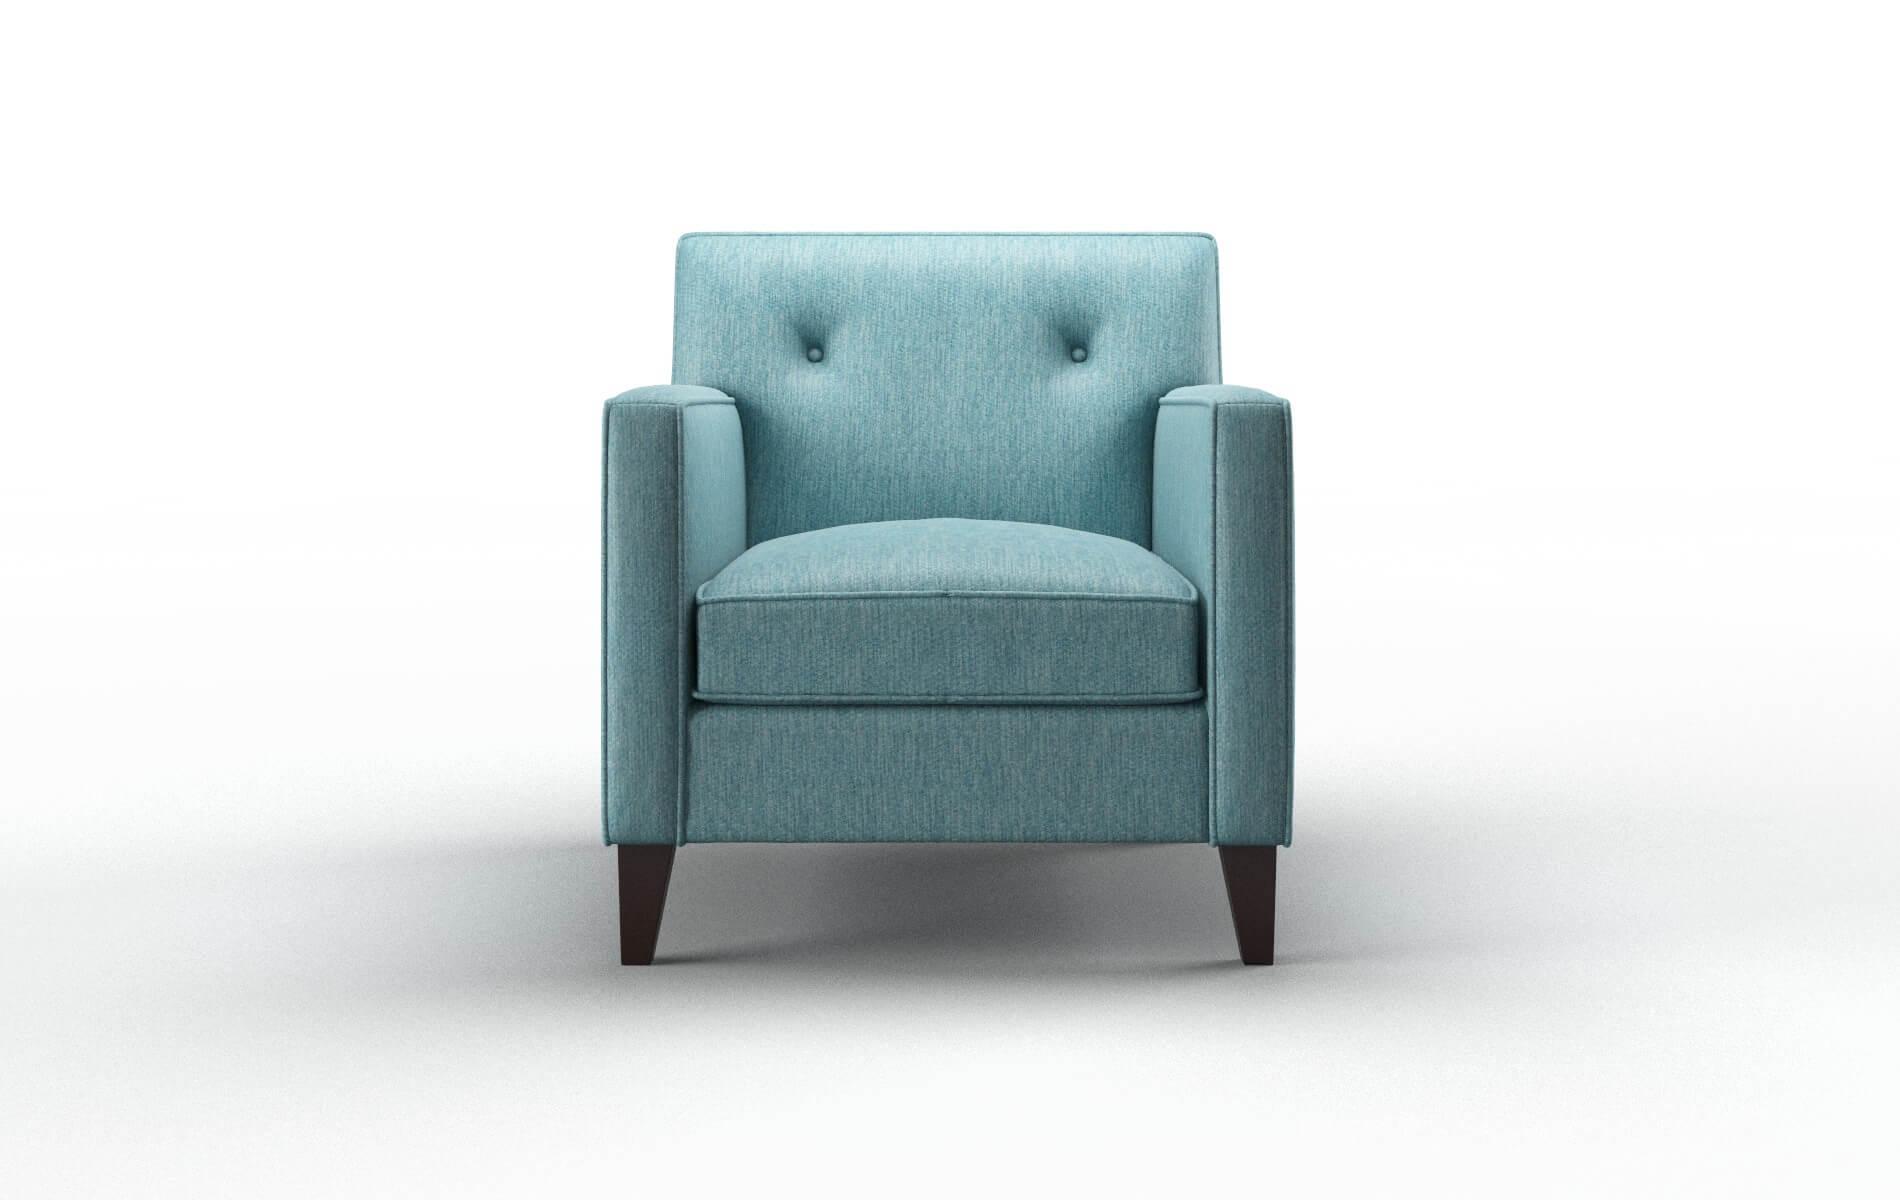 Harper Cosmo Turquoise Chair espresso legs 1